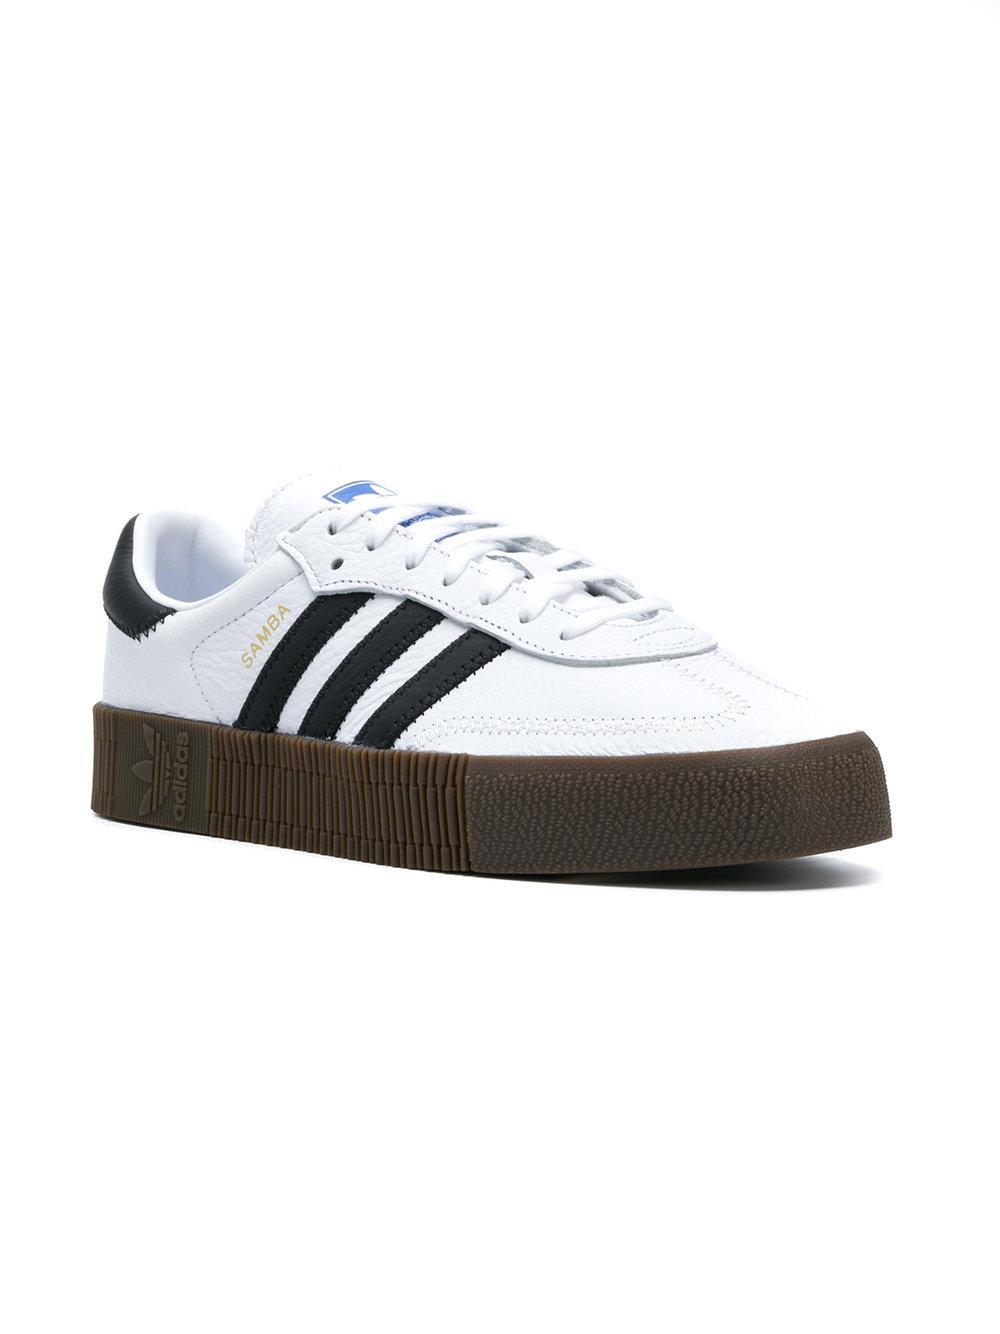 adidas Leather Originals Sambarose Sneakers in White